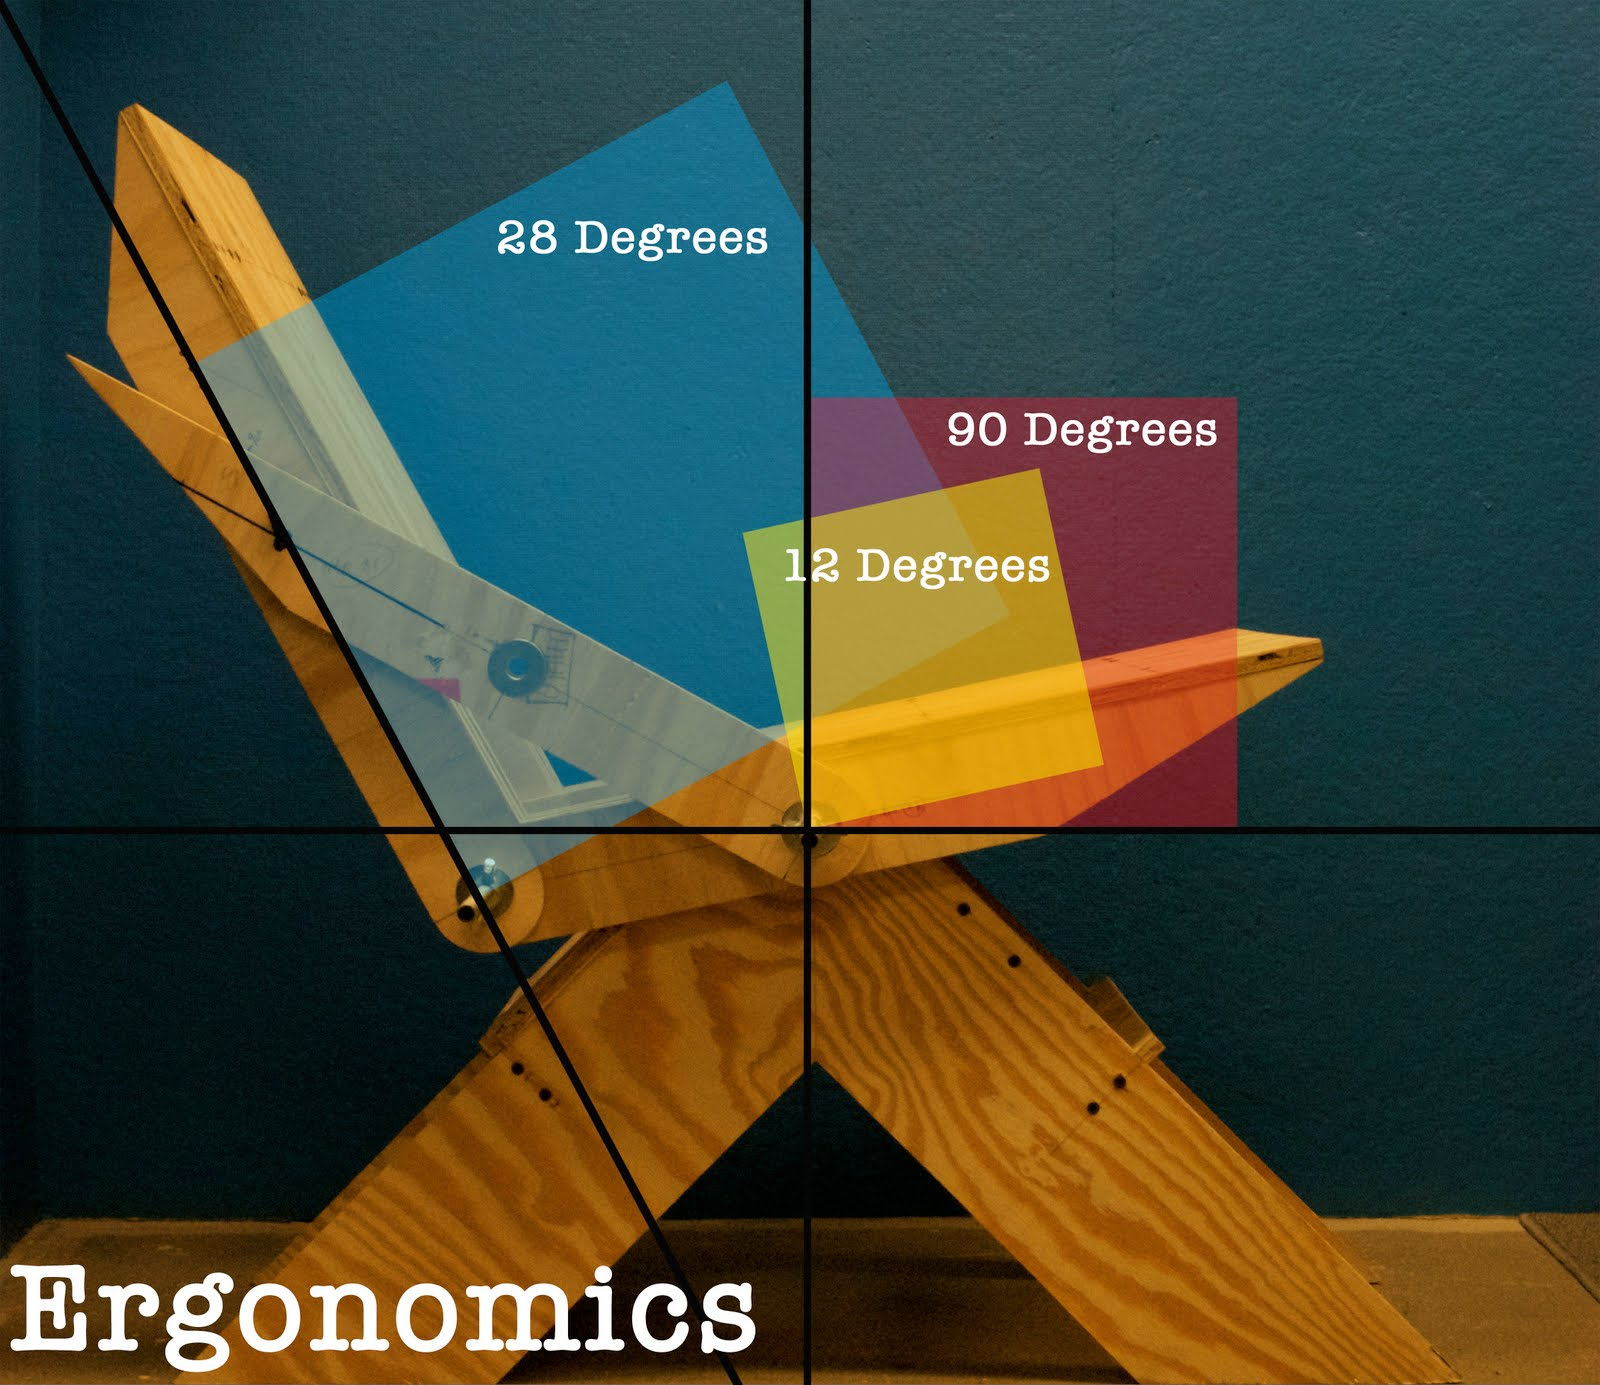 Ergonomic Chair Angle Desk Disassembly Jacksonporterip2011 Ergonomics